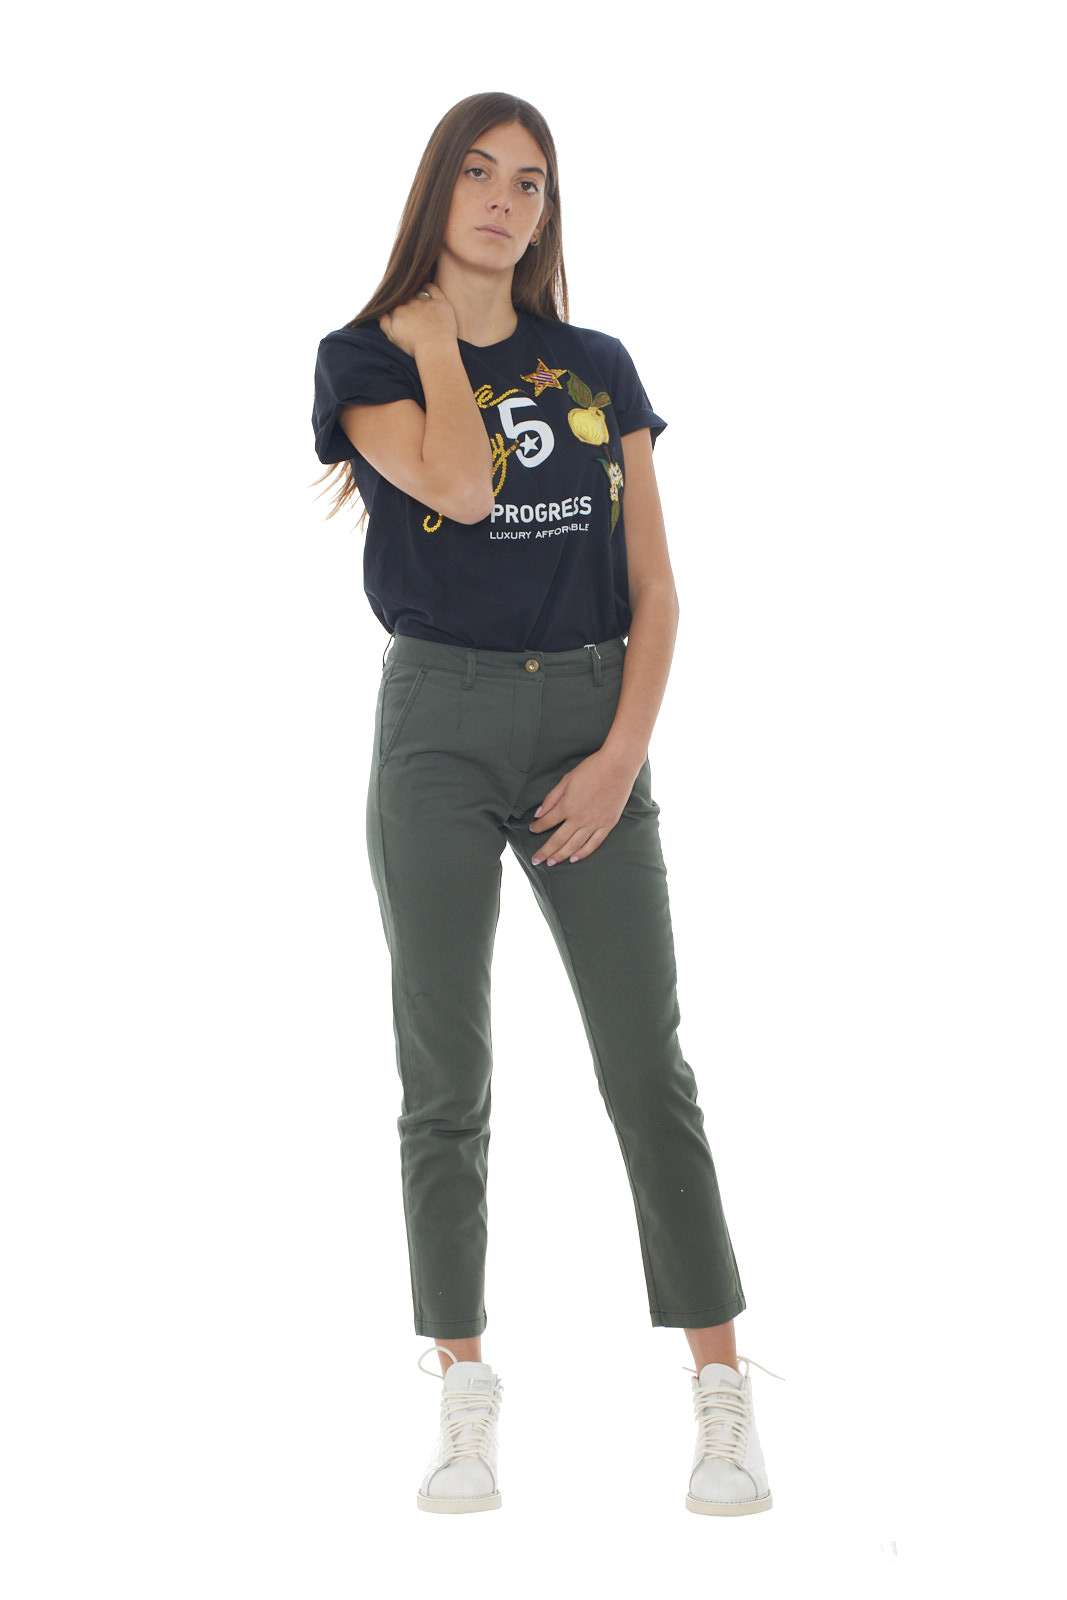 https://www.parmax.com/media/catalog/product/a/i/AI-outlet_parmax-pantaloni-donna-SH-Collection-18102019-D.jpg